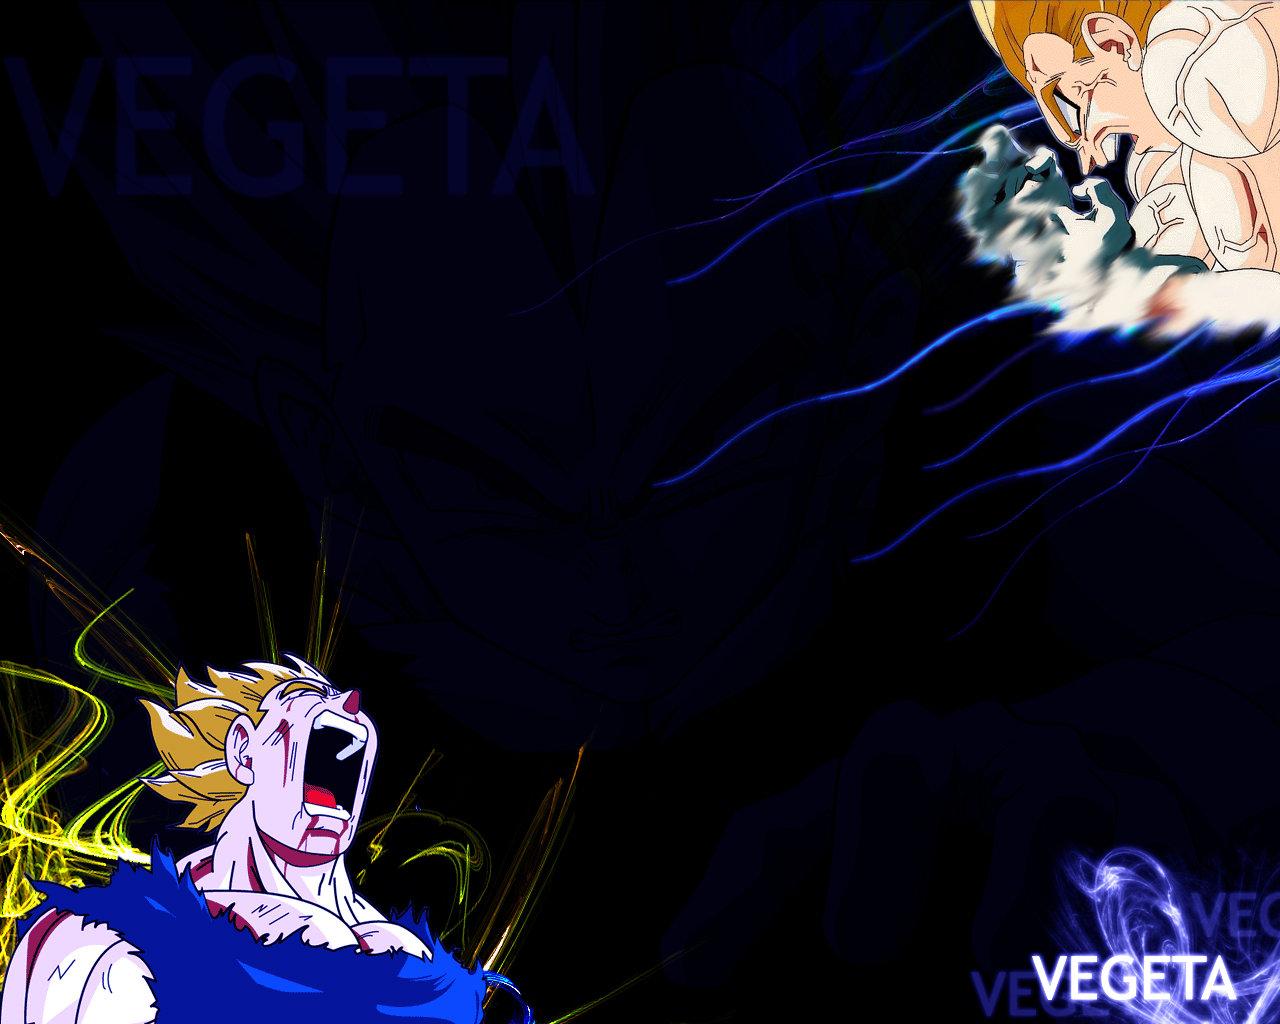 Vegeta wallpaper by fanatic19 1280x1024